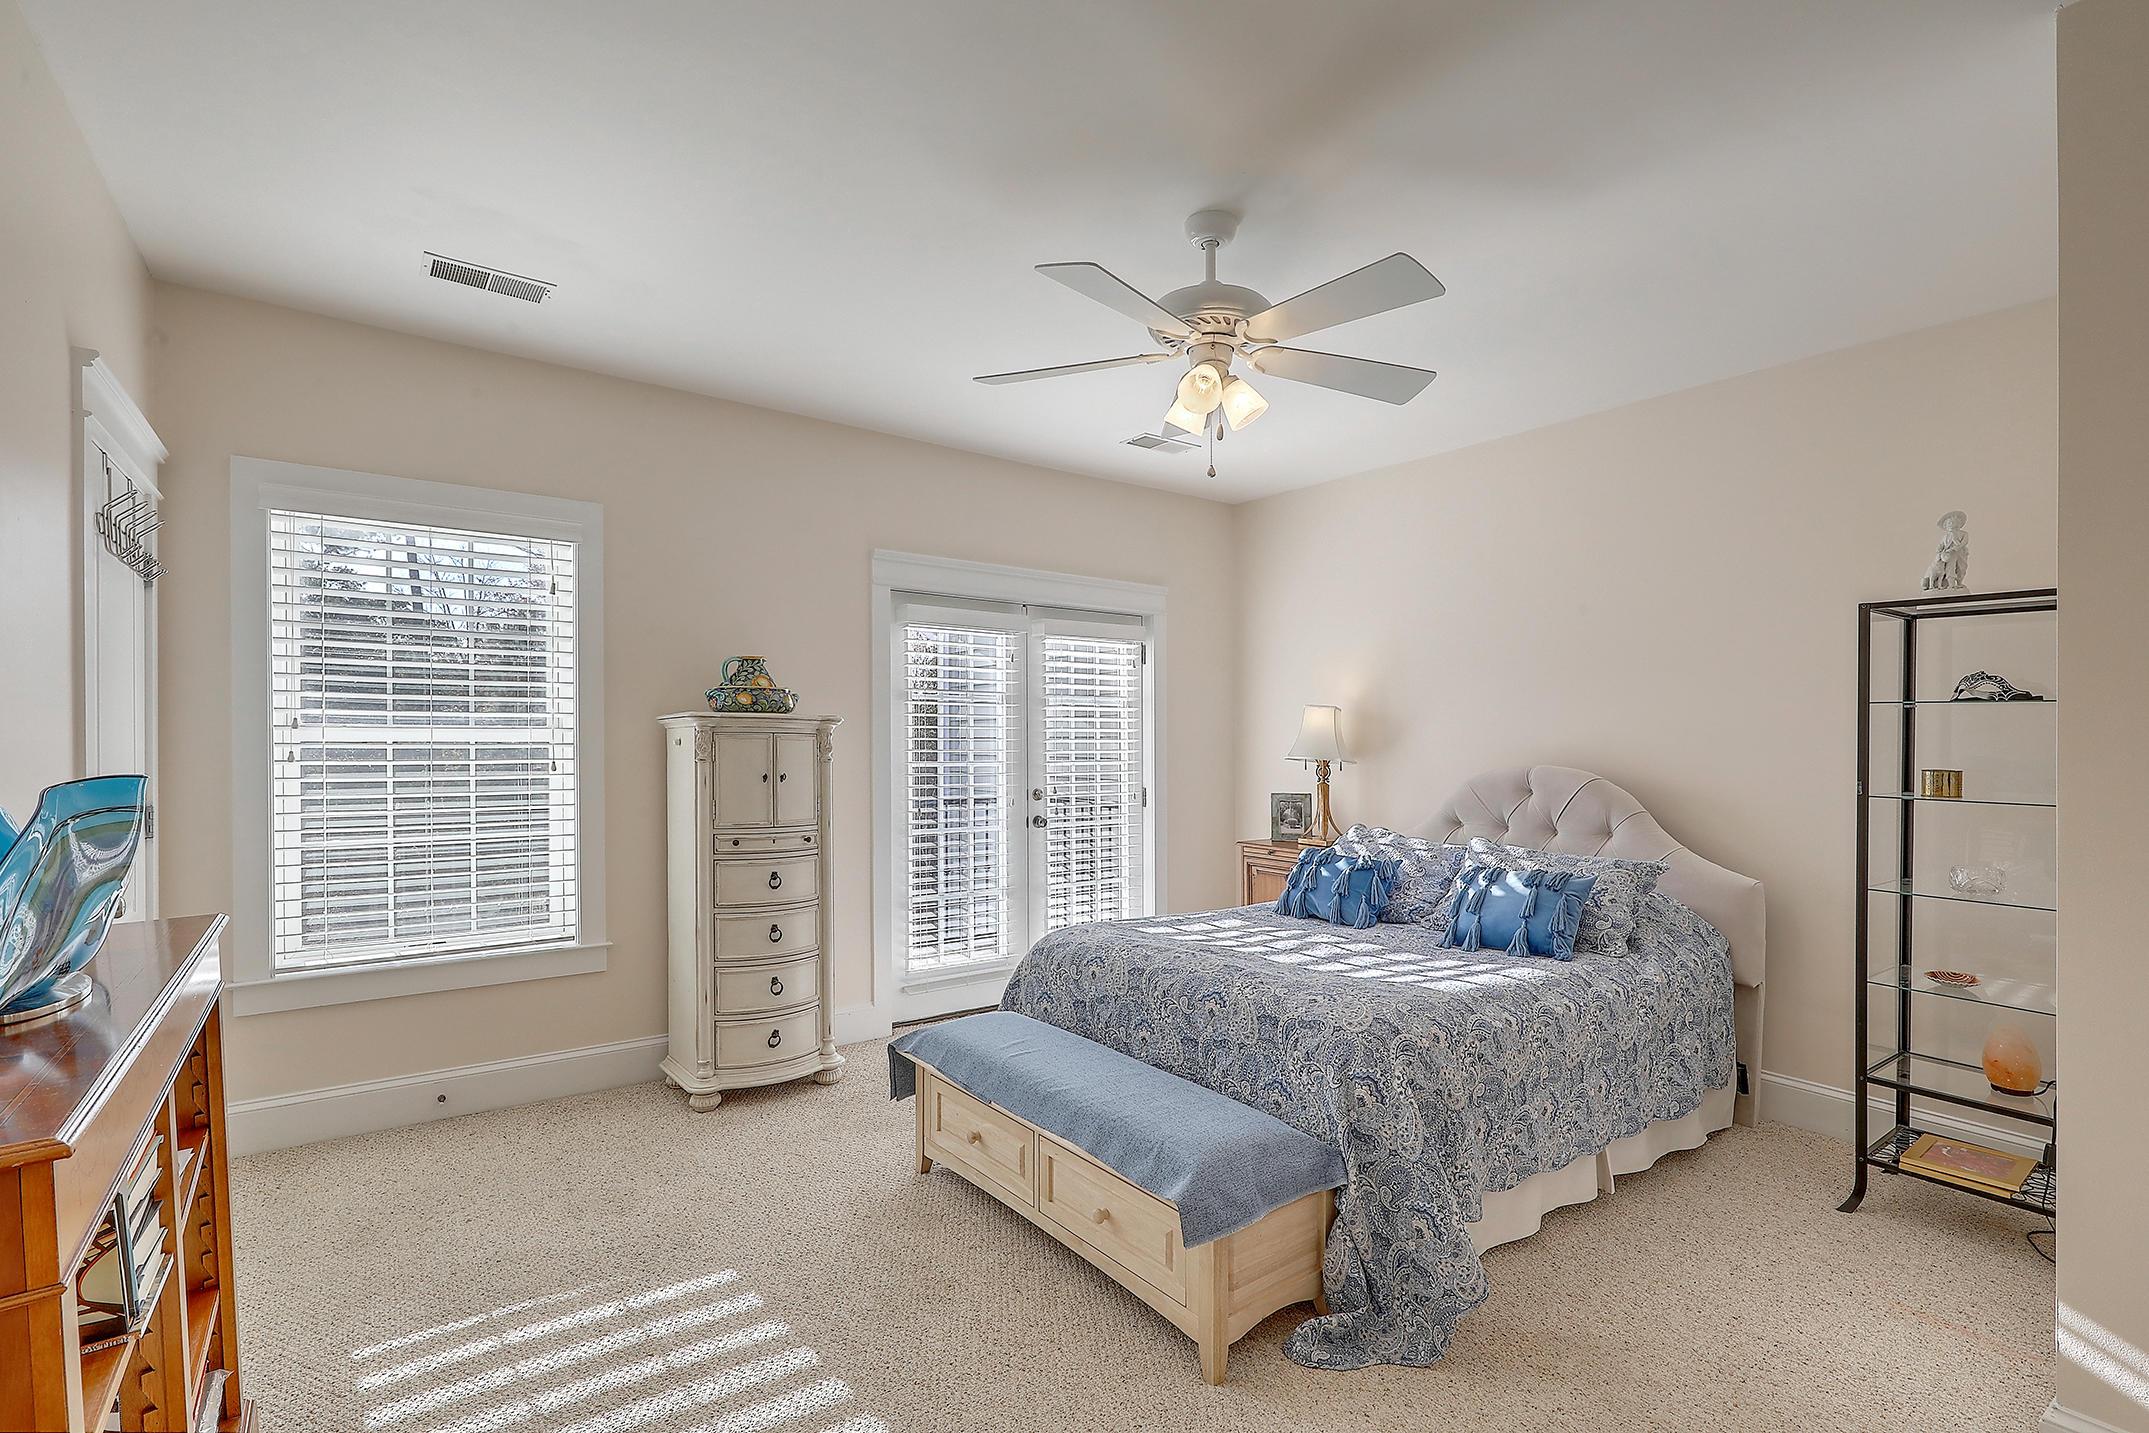 Etiwan Pointe Homes For Sale - 124 Winding Creek, Mount Pleasant, SC - 18